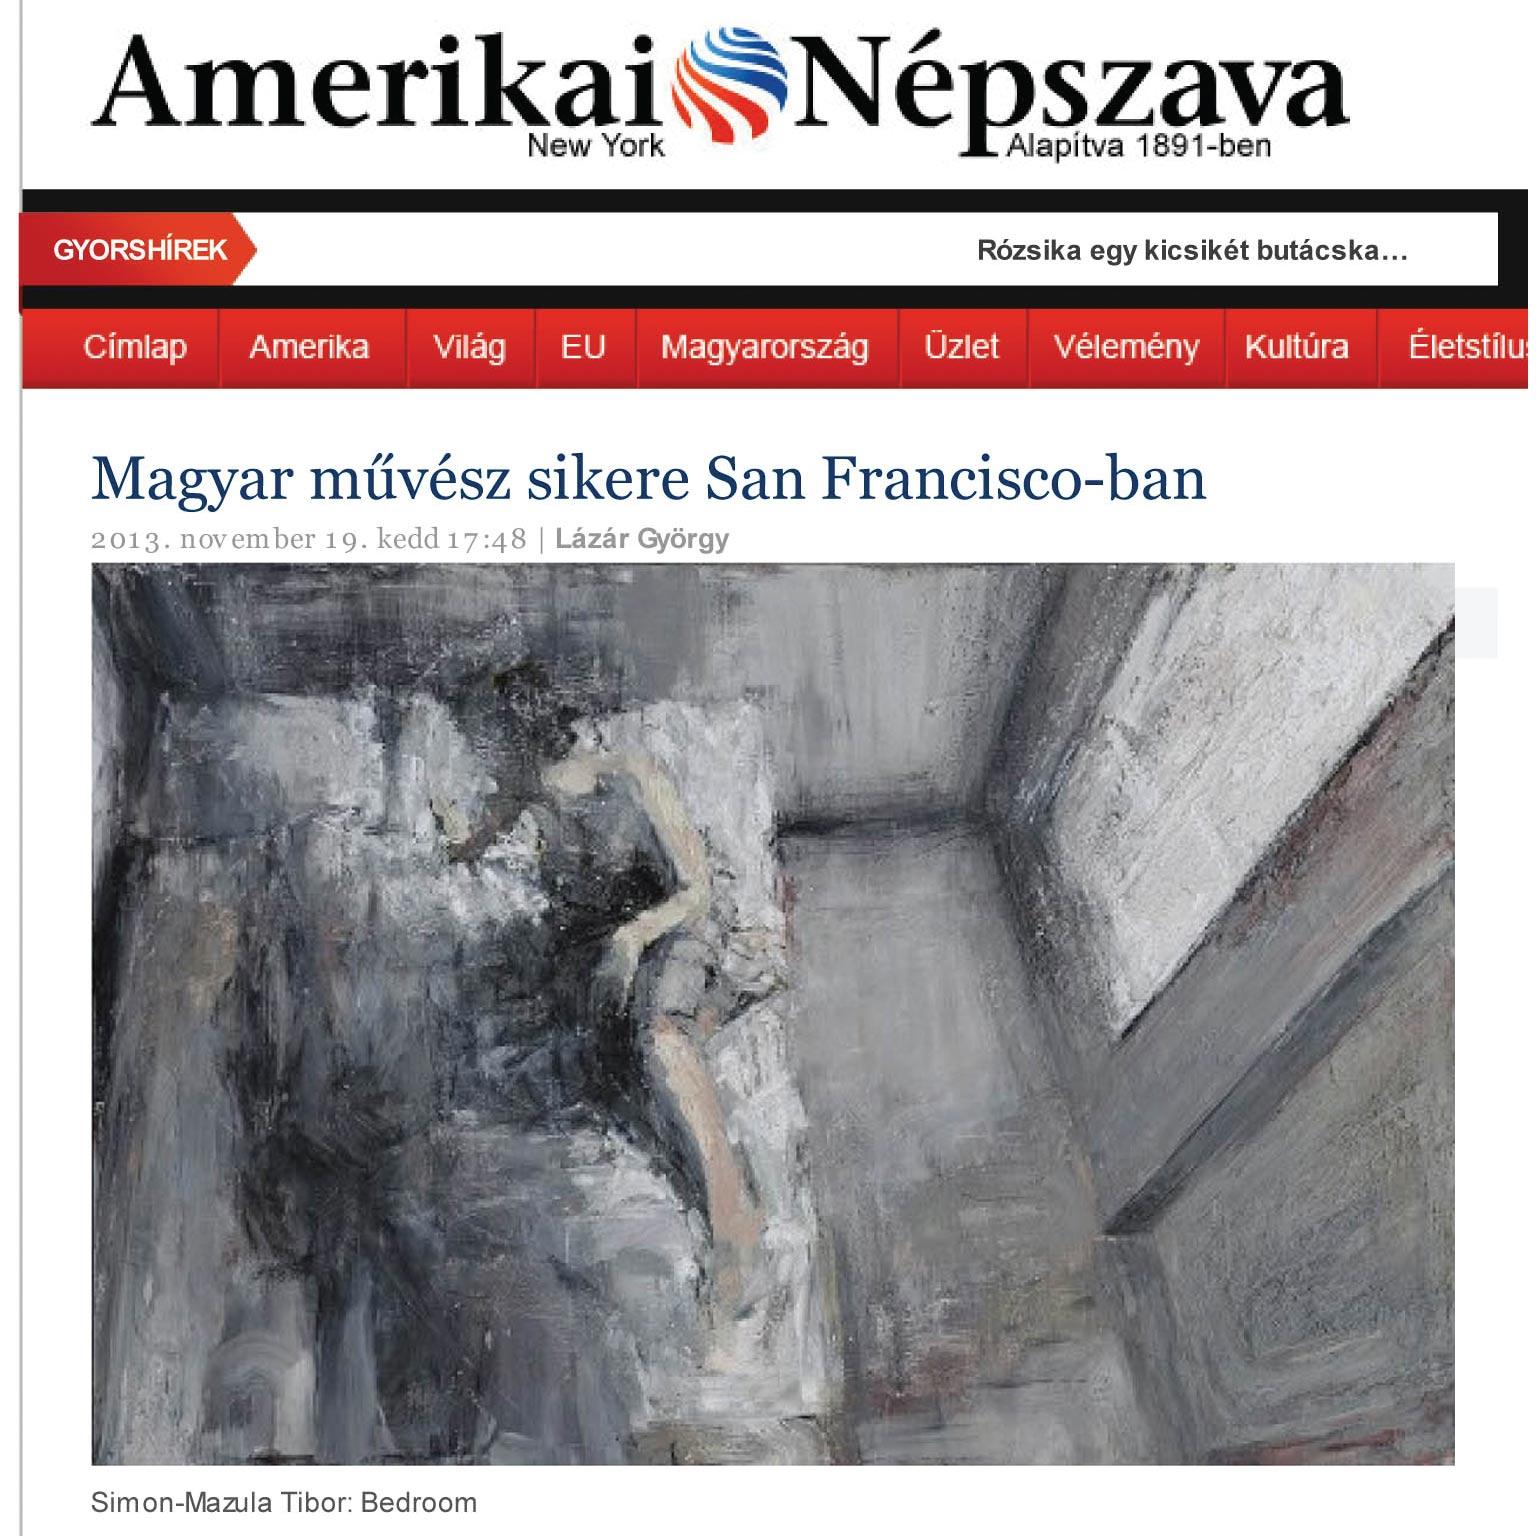 "György Lázár,"" A Hungaroian Artist in San Francisco's Curt"" ,www.nepszava.com, November 19 2013, United States / TRANSLATED"